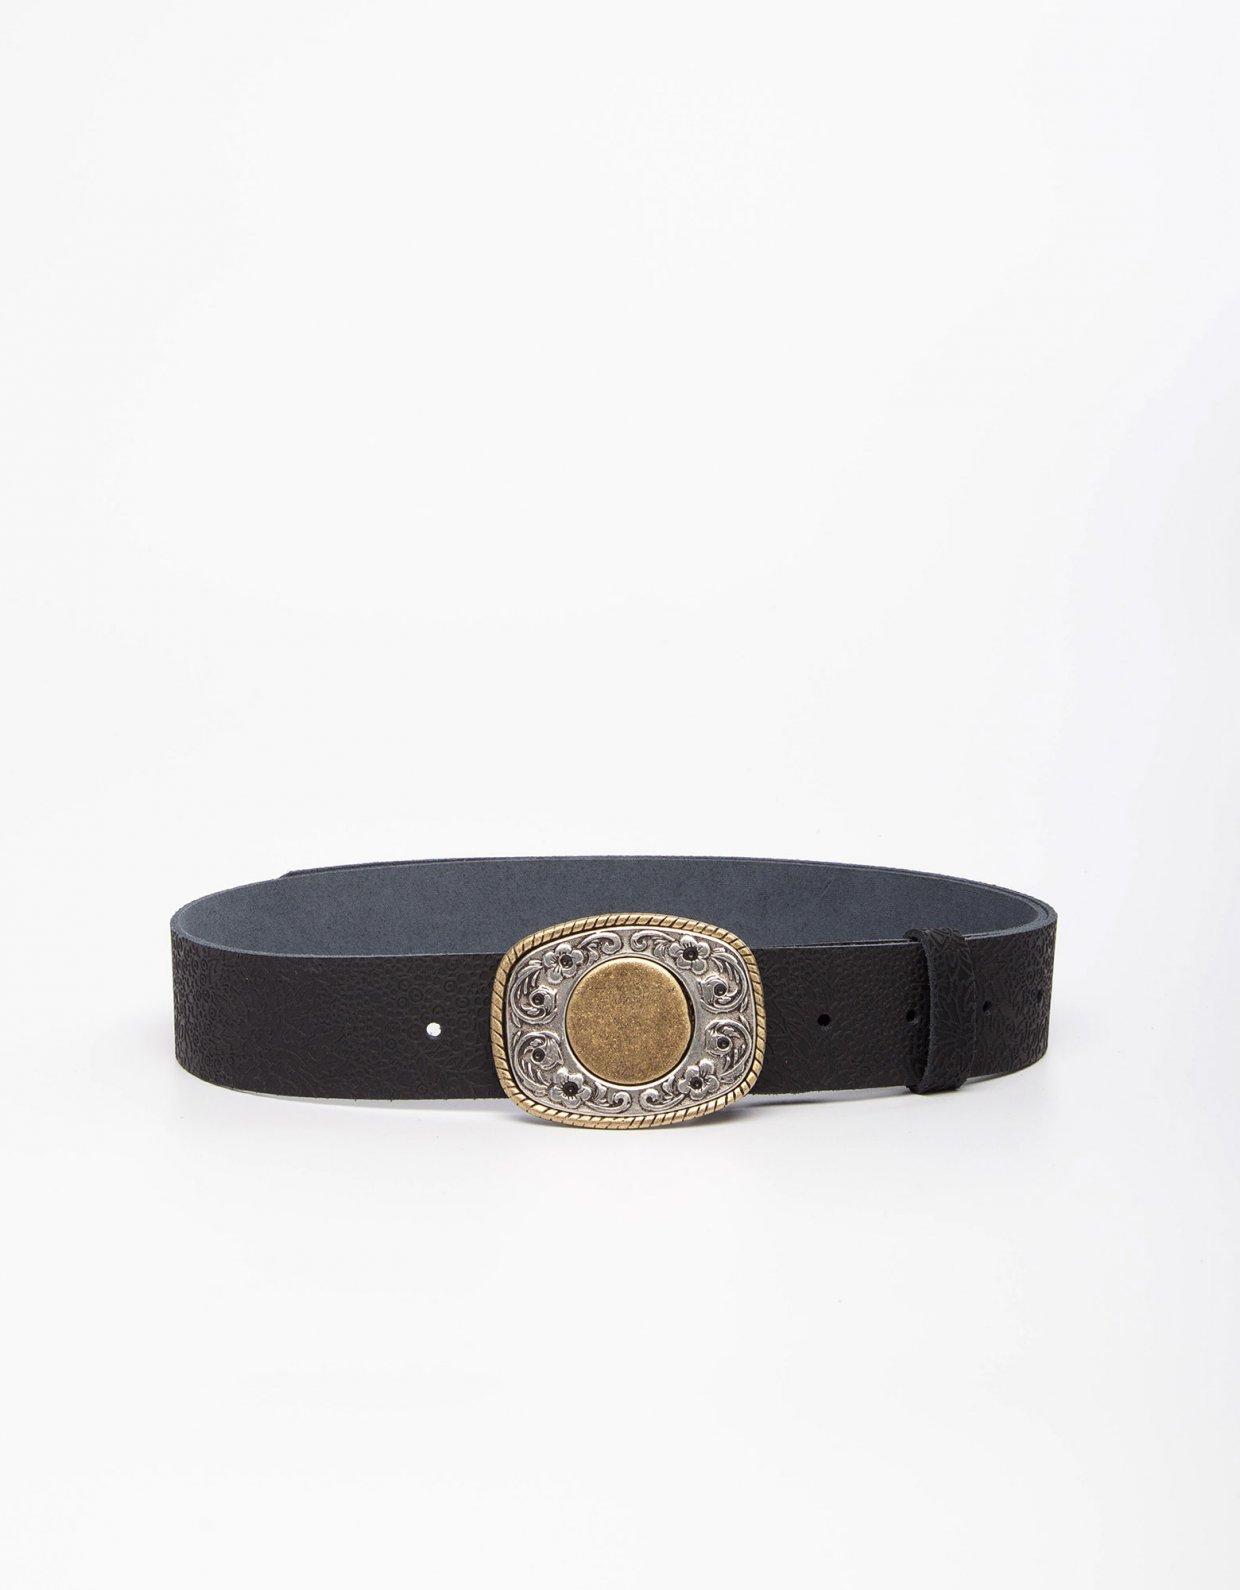 Individual Art Leather Fresh black belt